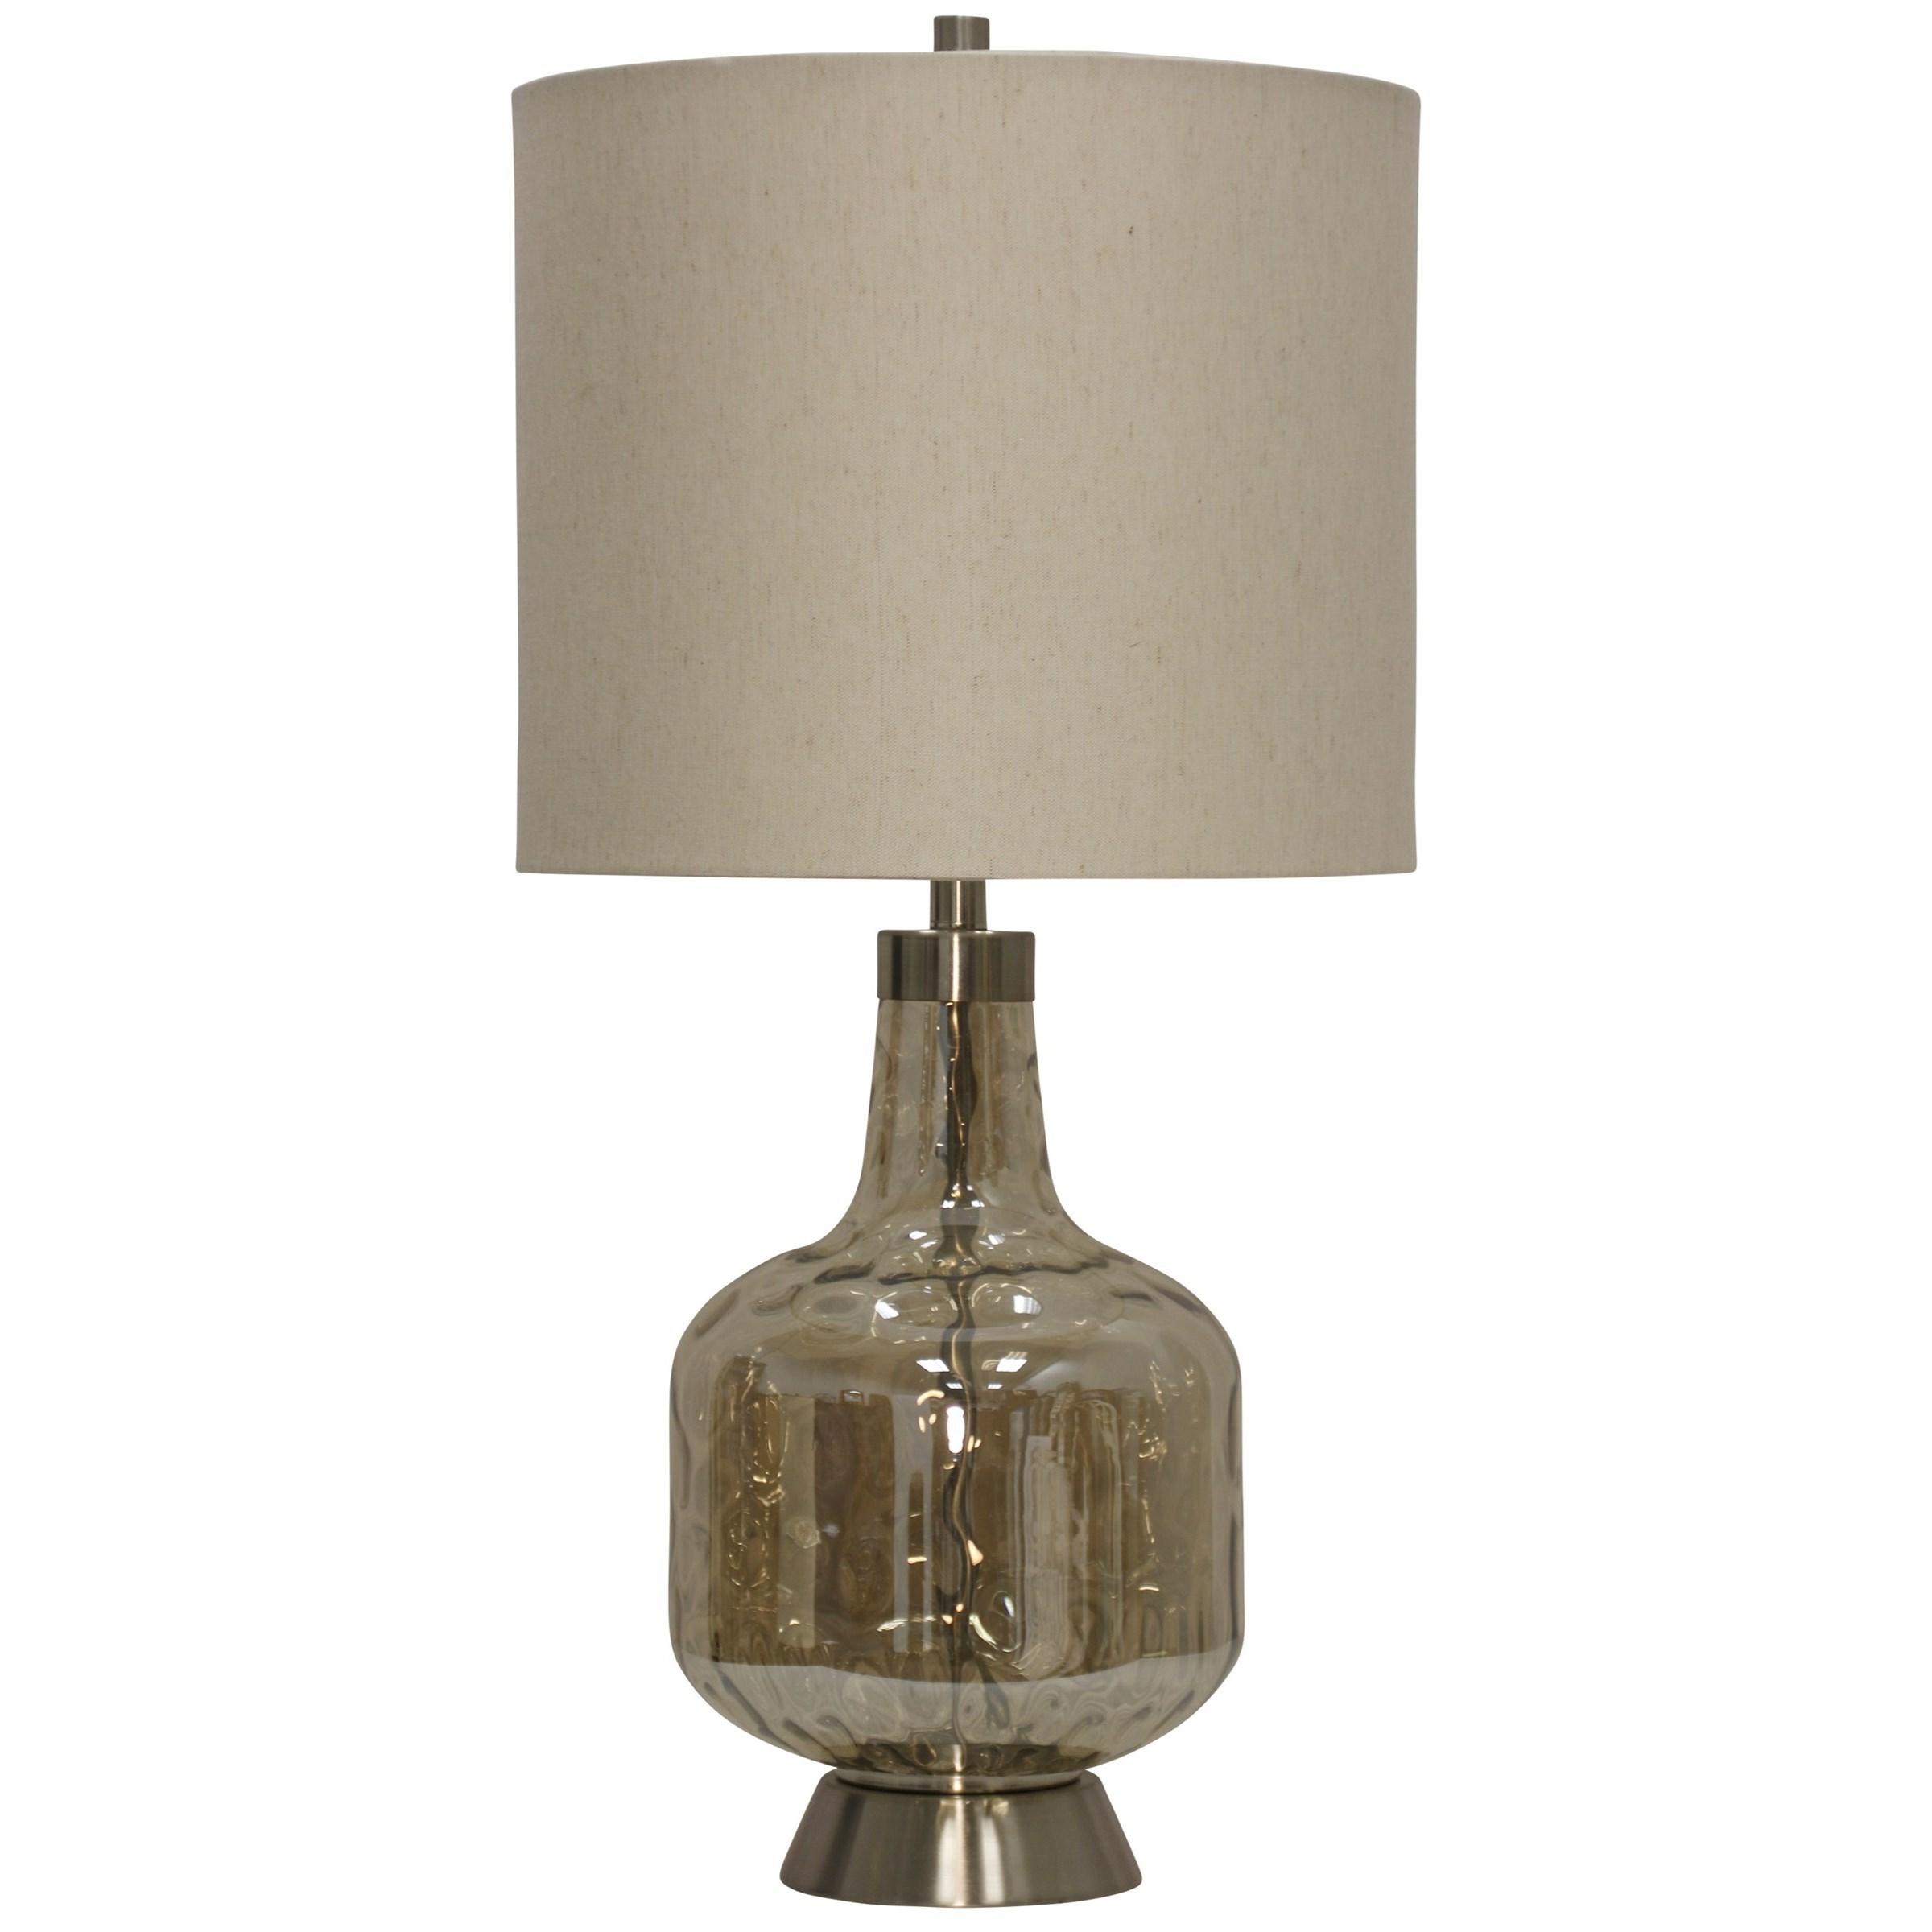 StyleCraft LampsGlass U0026 Steel Base Transitional Table Lamp